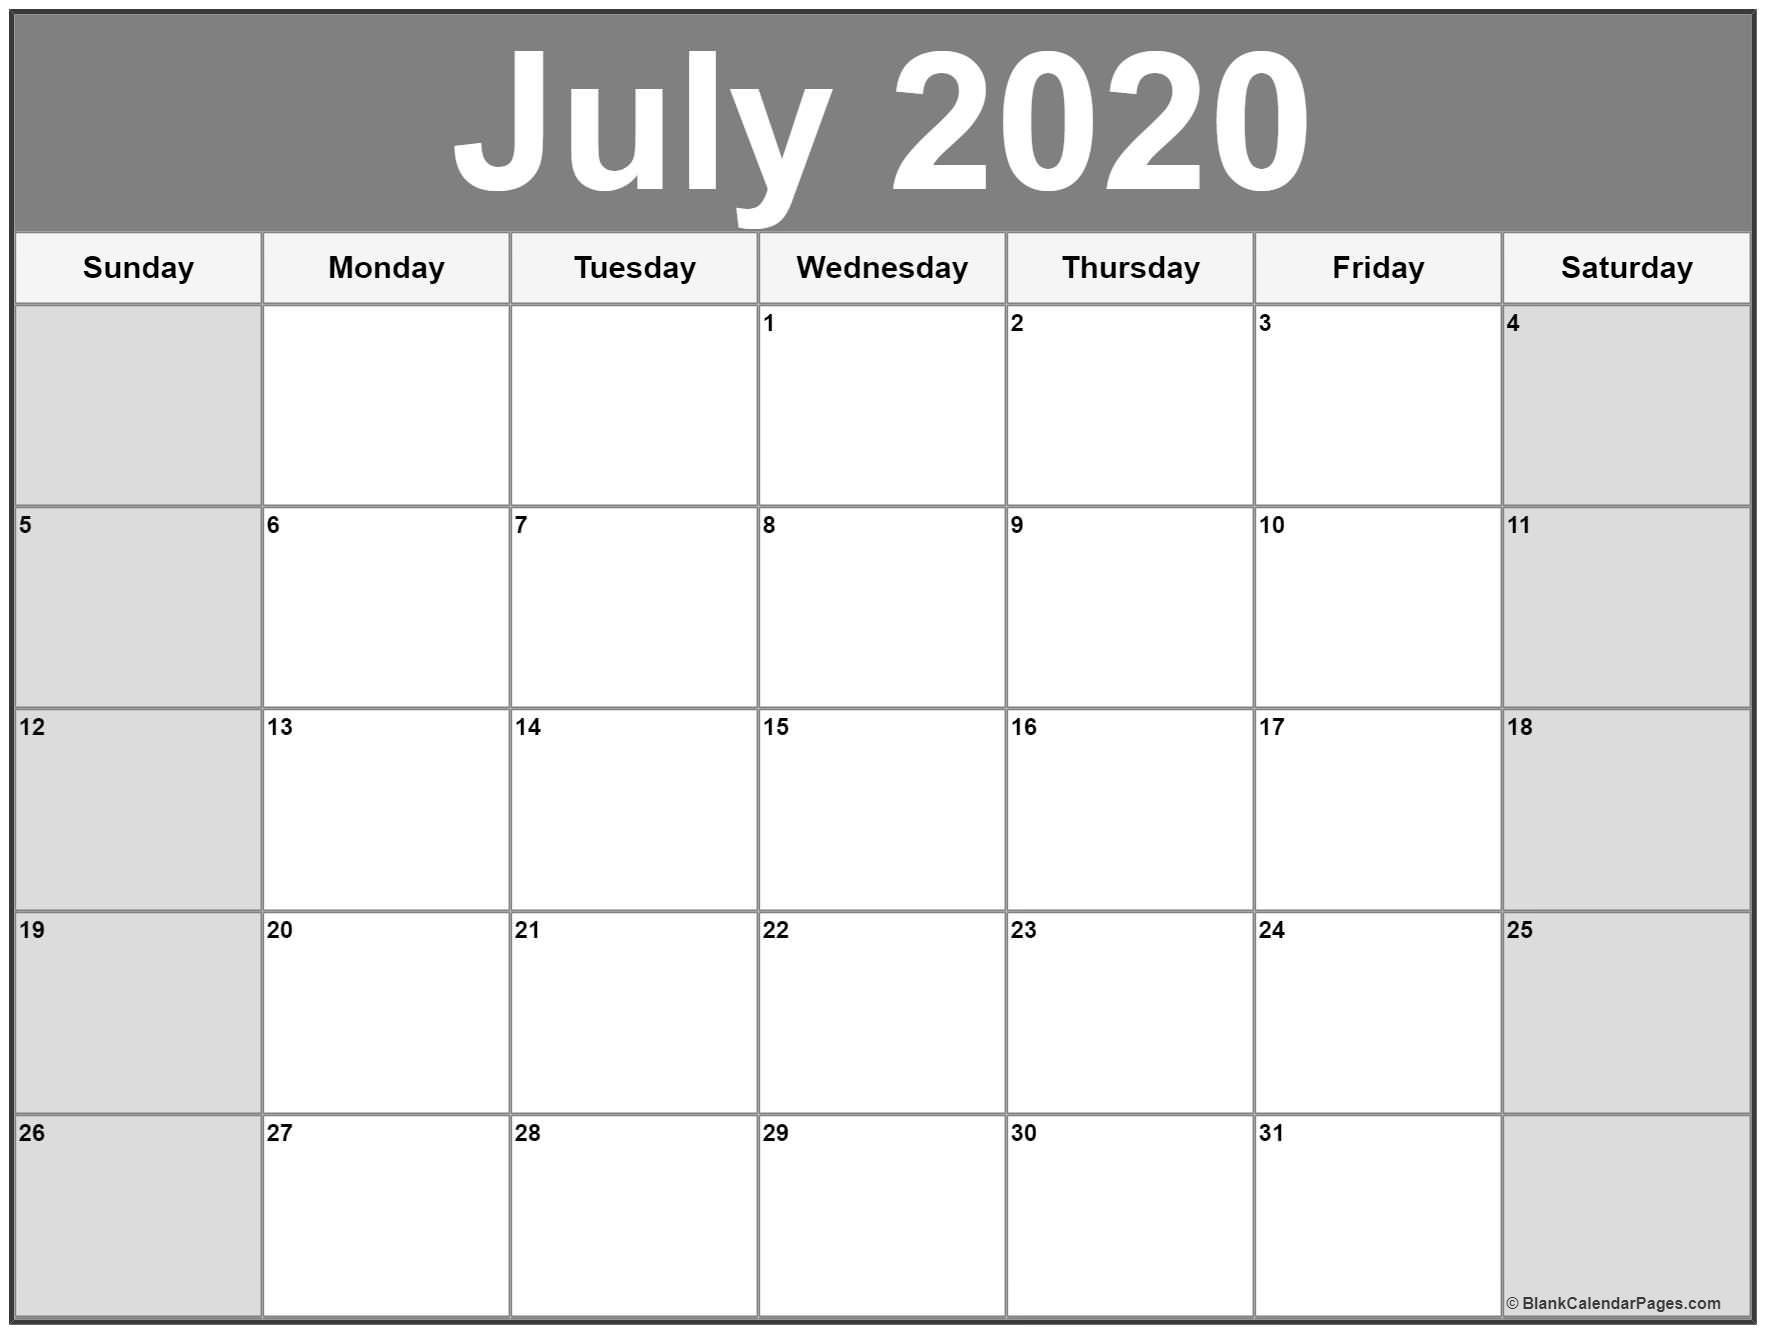 July 2020 Printable Calendar Template #2020Calendars with Vetex 2020 Word Calendar Download